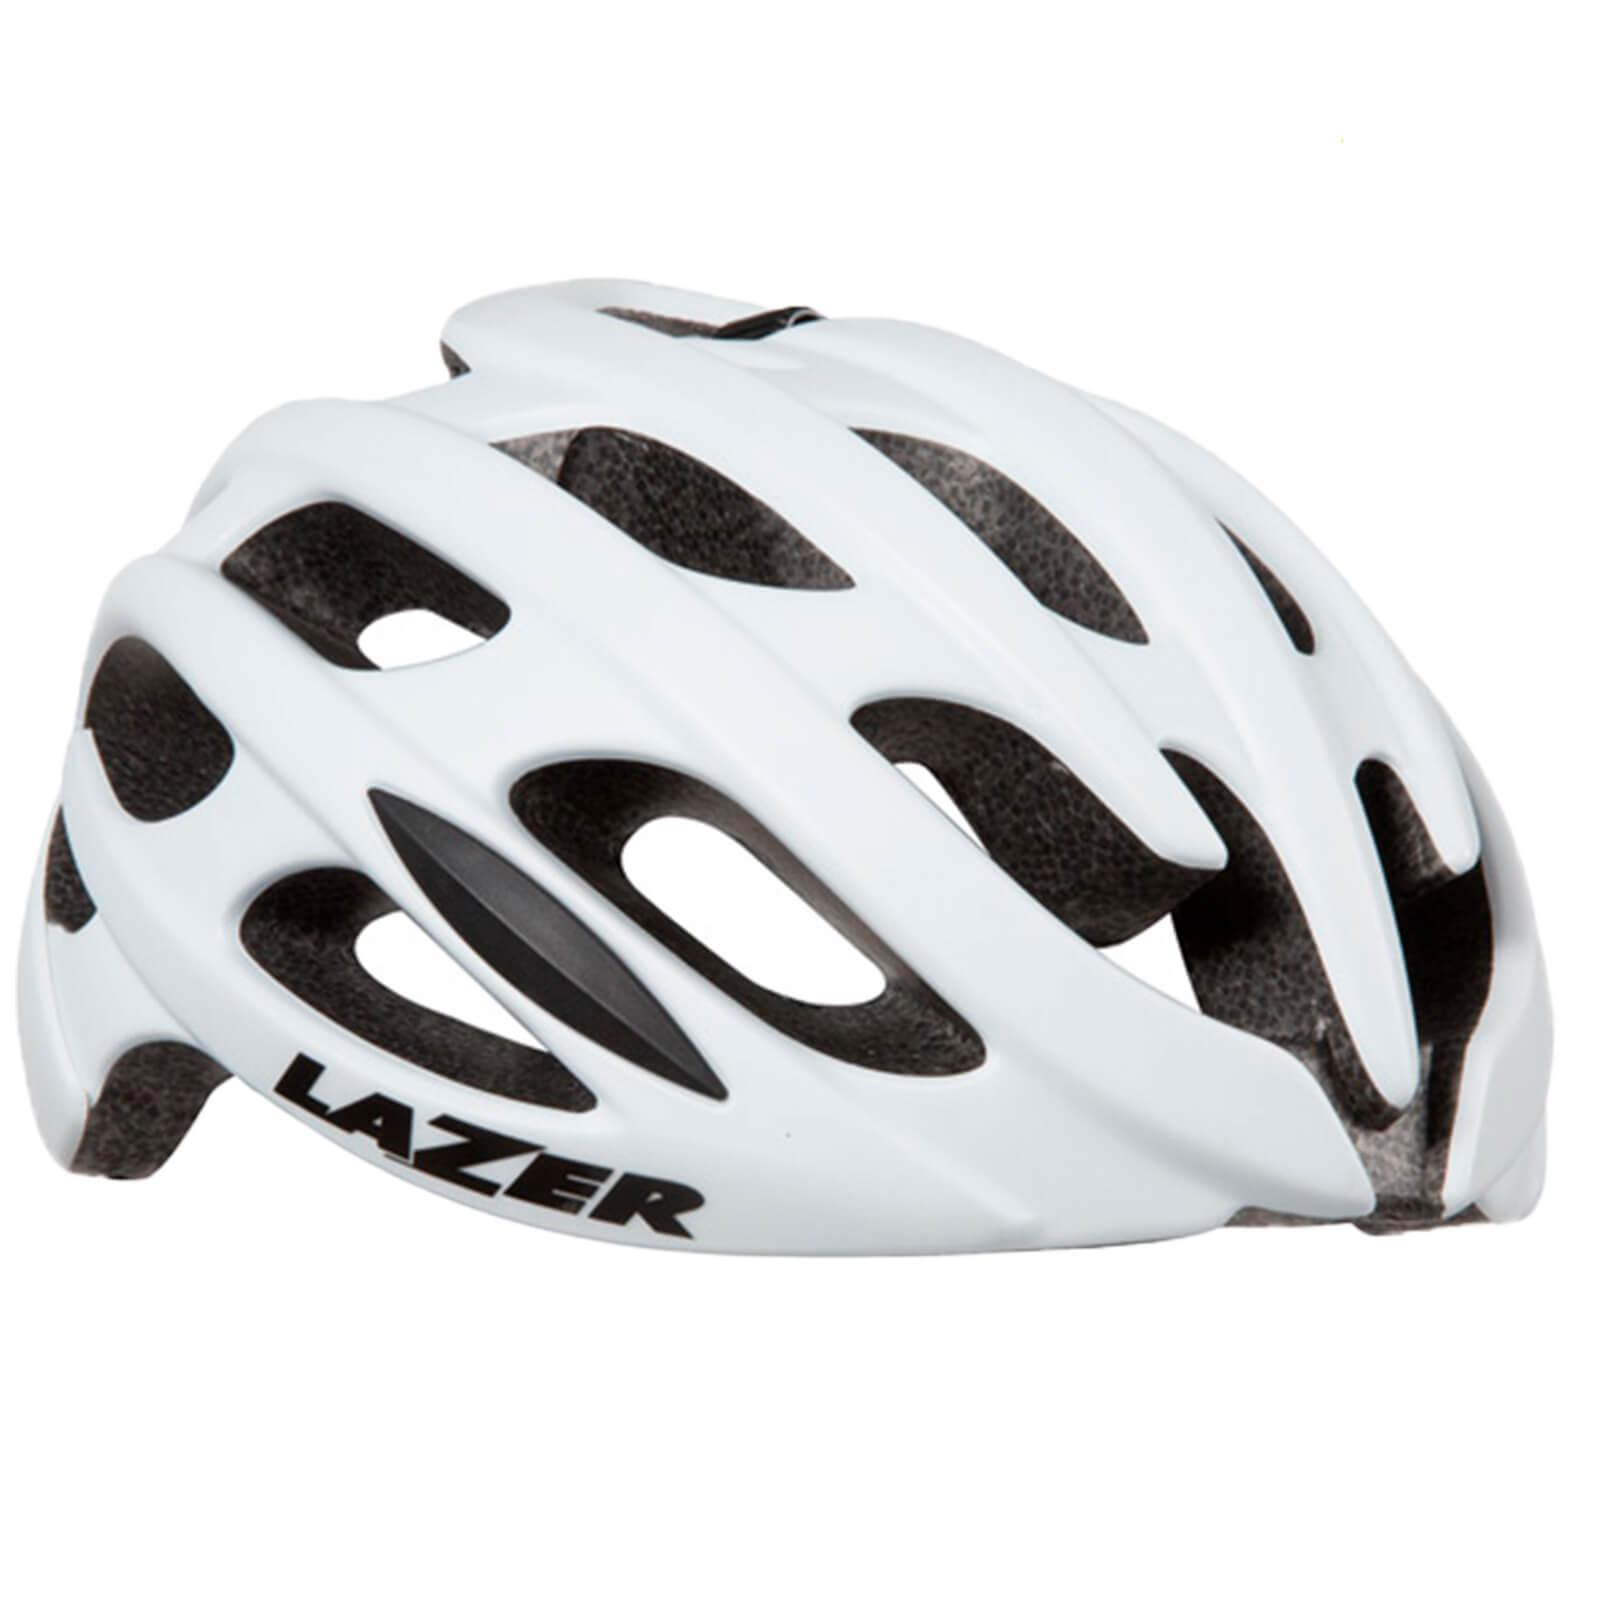 MATTE BLACK MIPS Road Cycling Helmet NEW Lazer BLADE